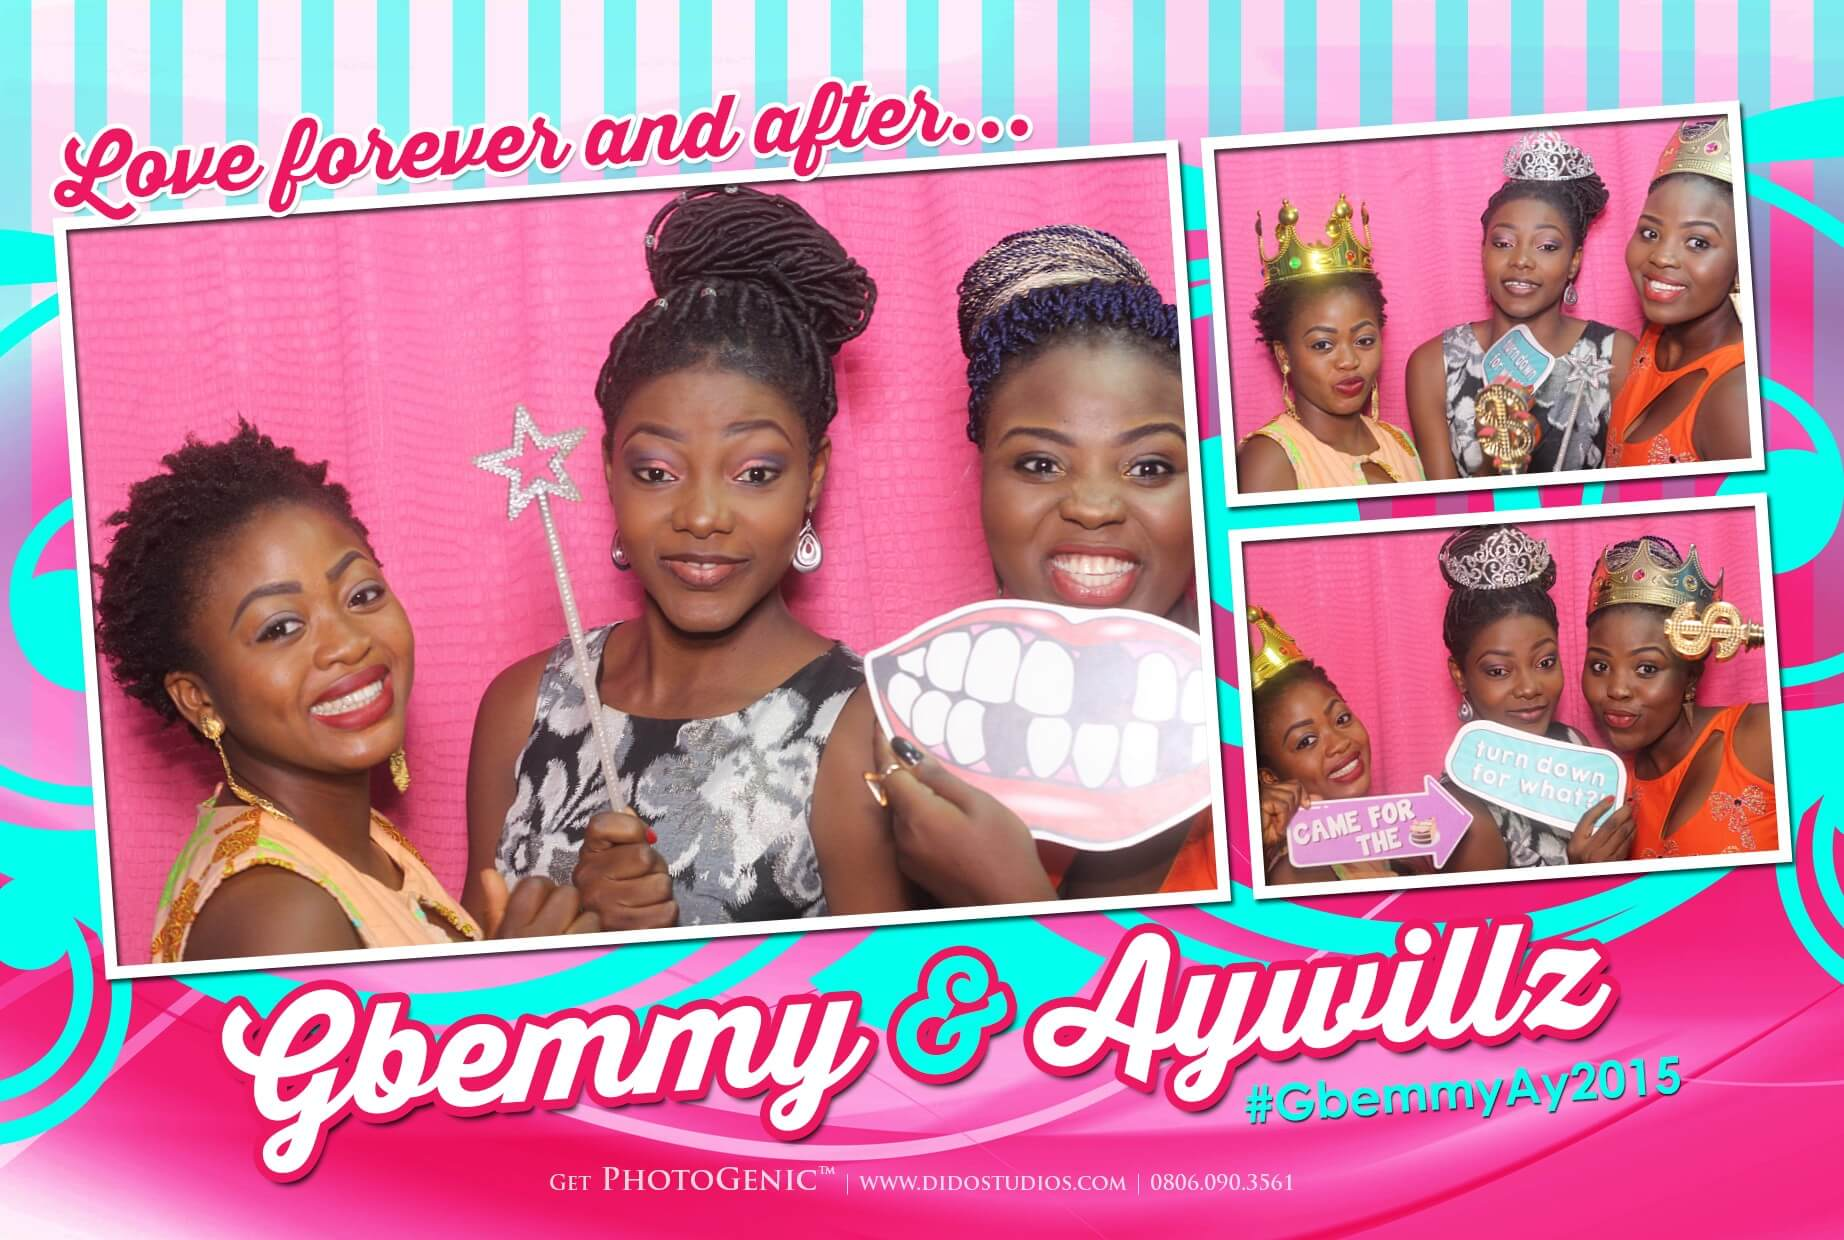 Exhibition Booth Lagos : Gbemmy aywillz photogenic photobooth awarded best